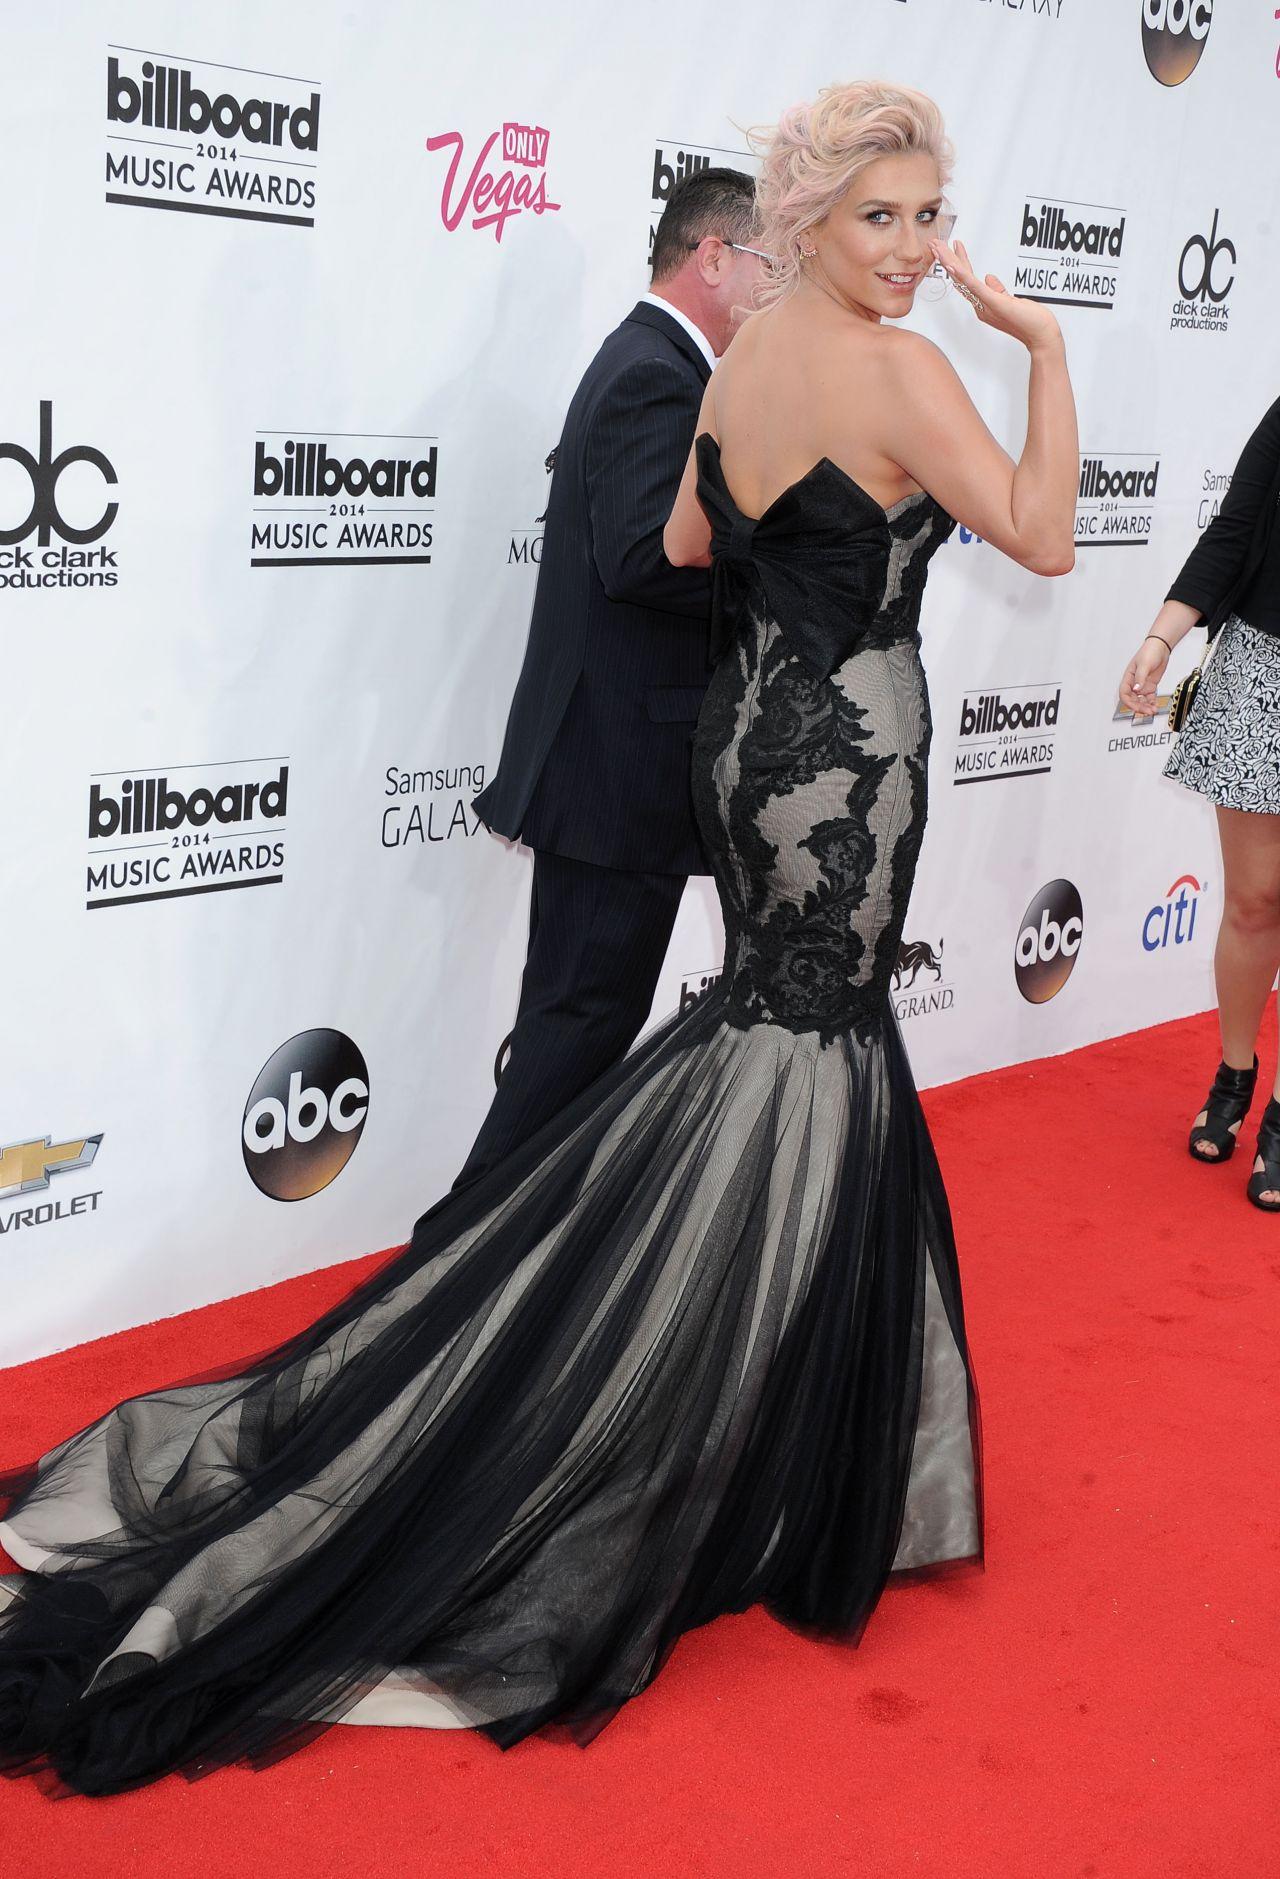 Billboard Music Awards 2016 The Best Hair And Makeup: 2014 Billboard Music Awards In Las Vegas